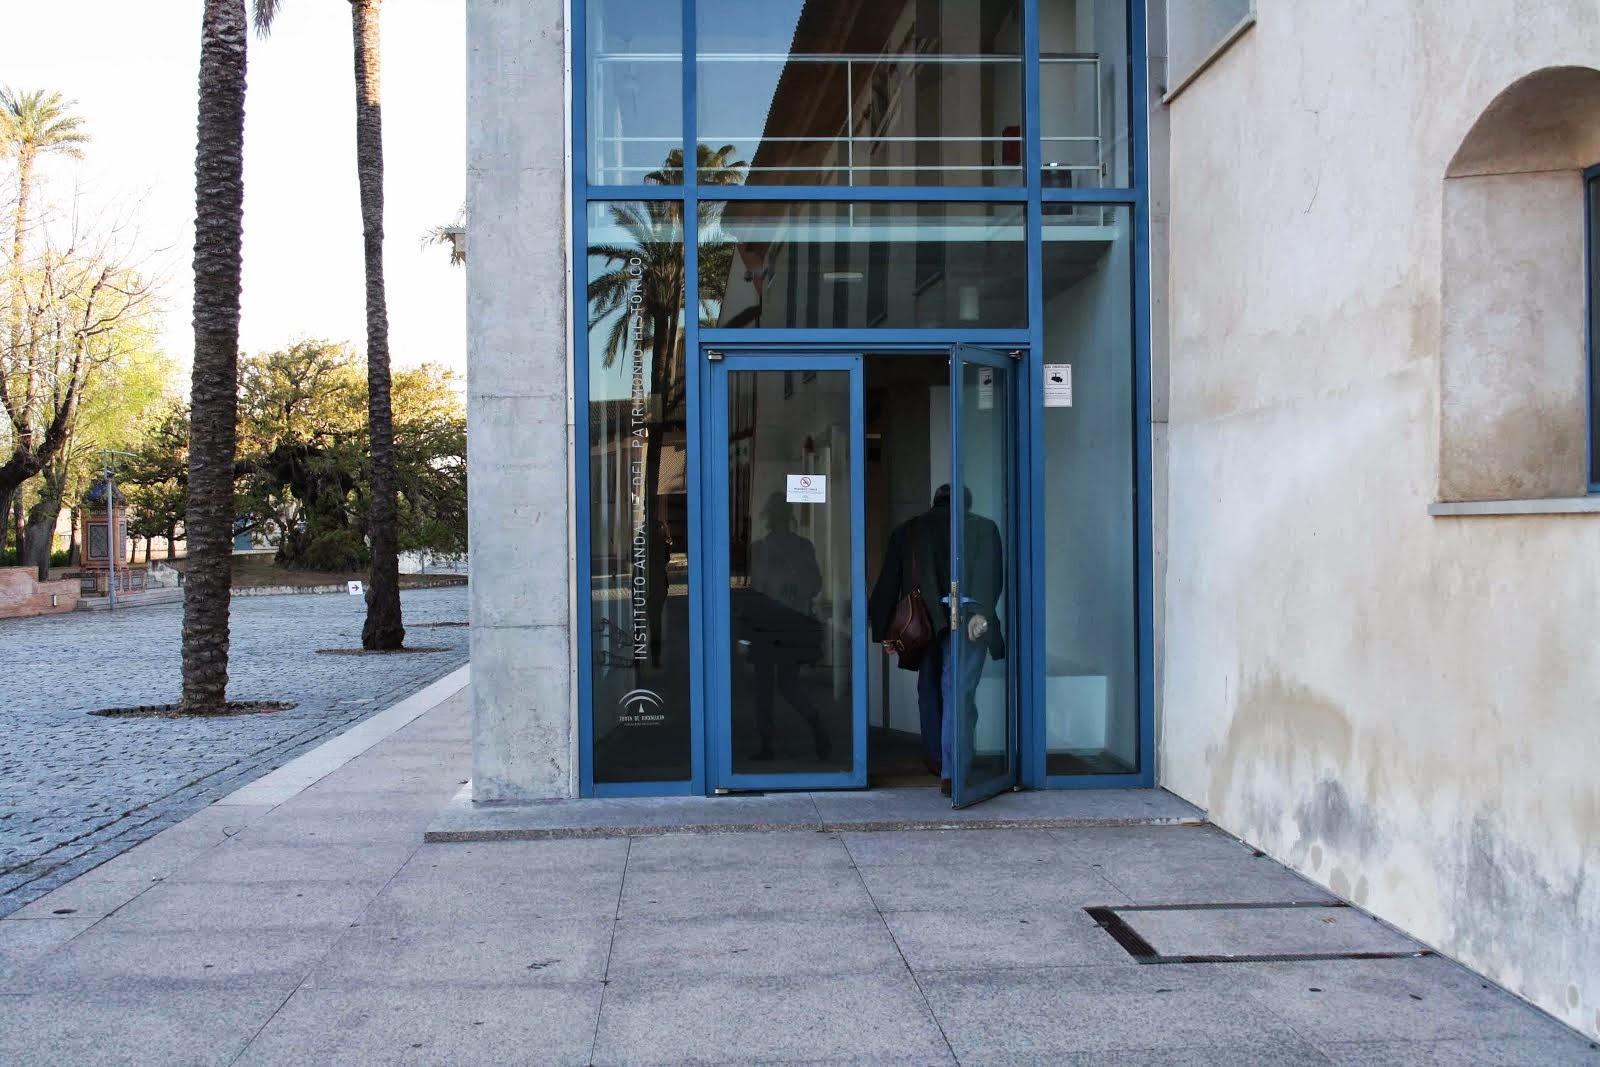 empleo sector restauracion andalucia: